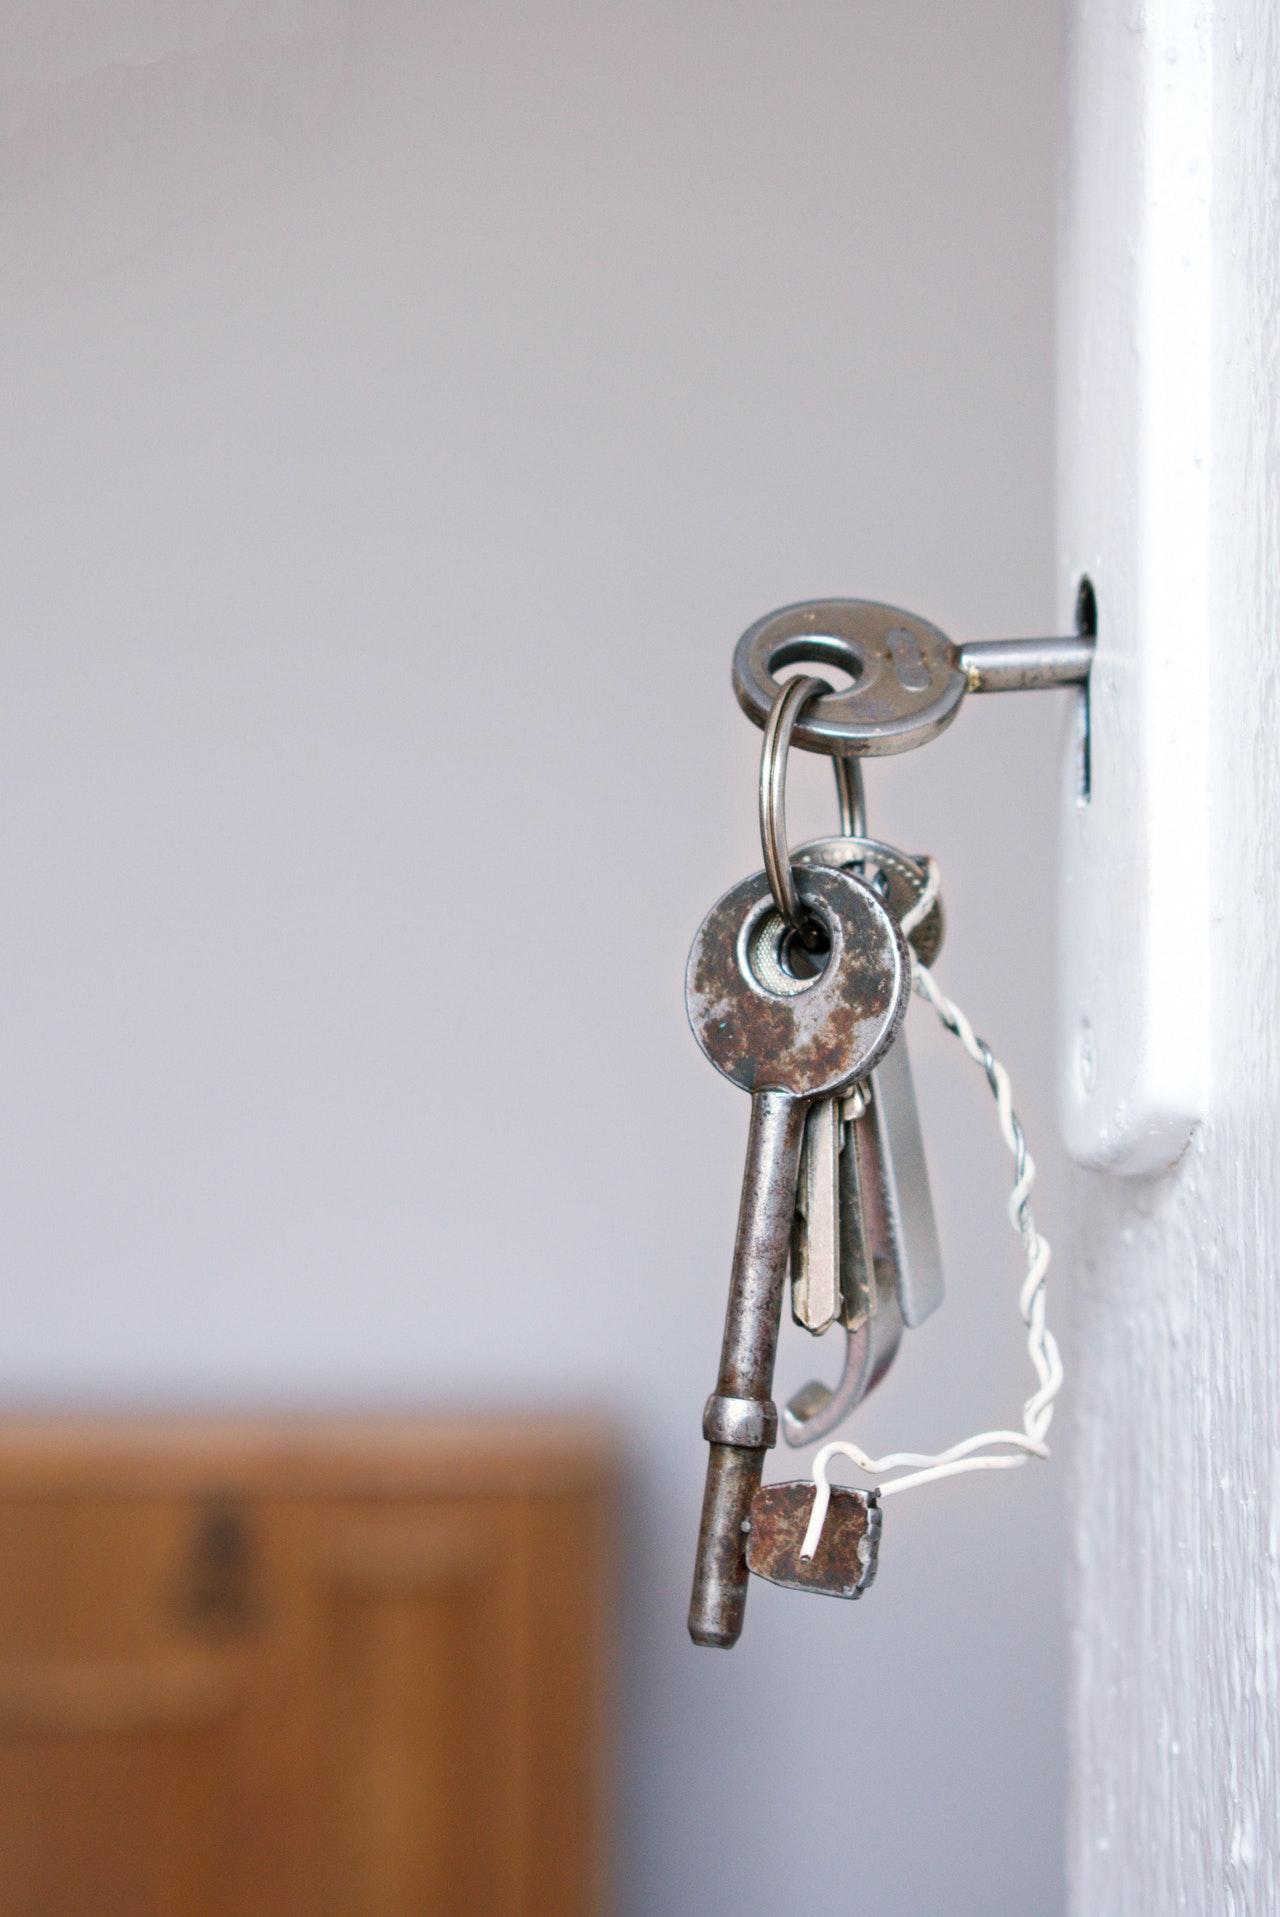 sleutels in het slot